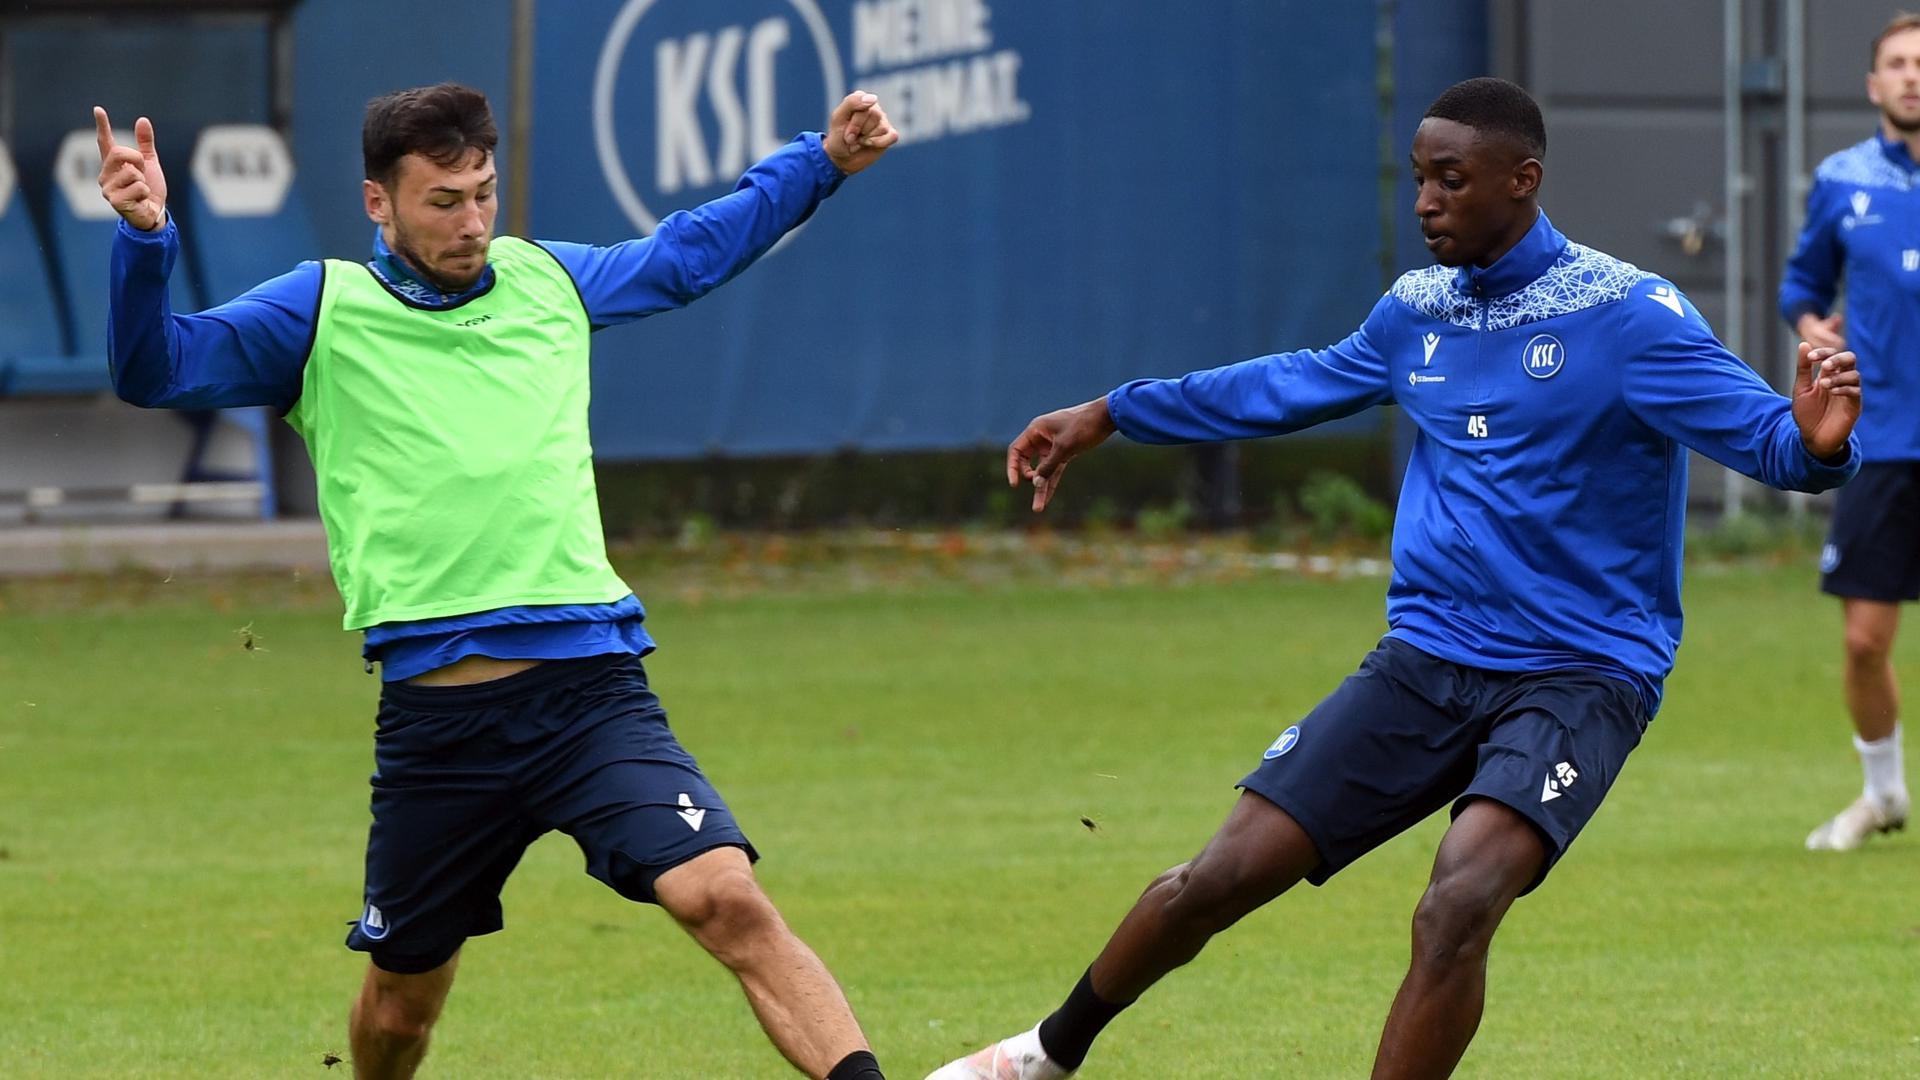 Kommen und Gehen: Lukas Fröde bemüht sich am Montagvormittag im KSC-Training gegen Felix Iroerere (rechts) um  den Ball.